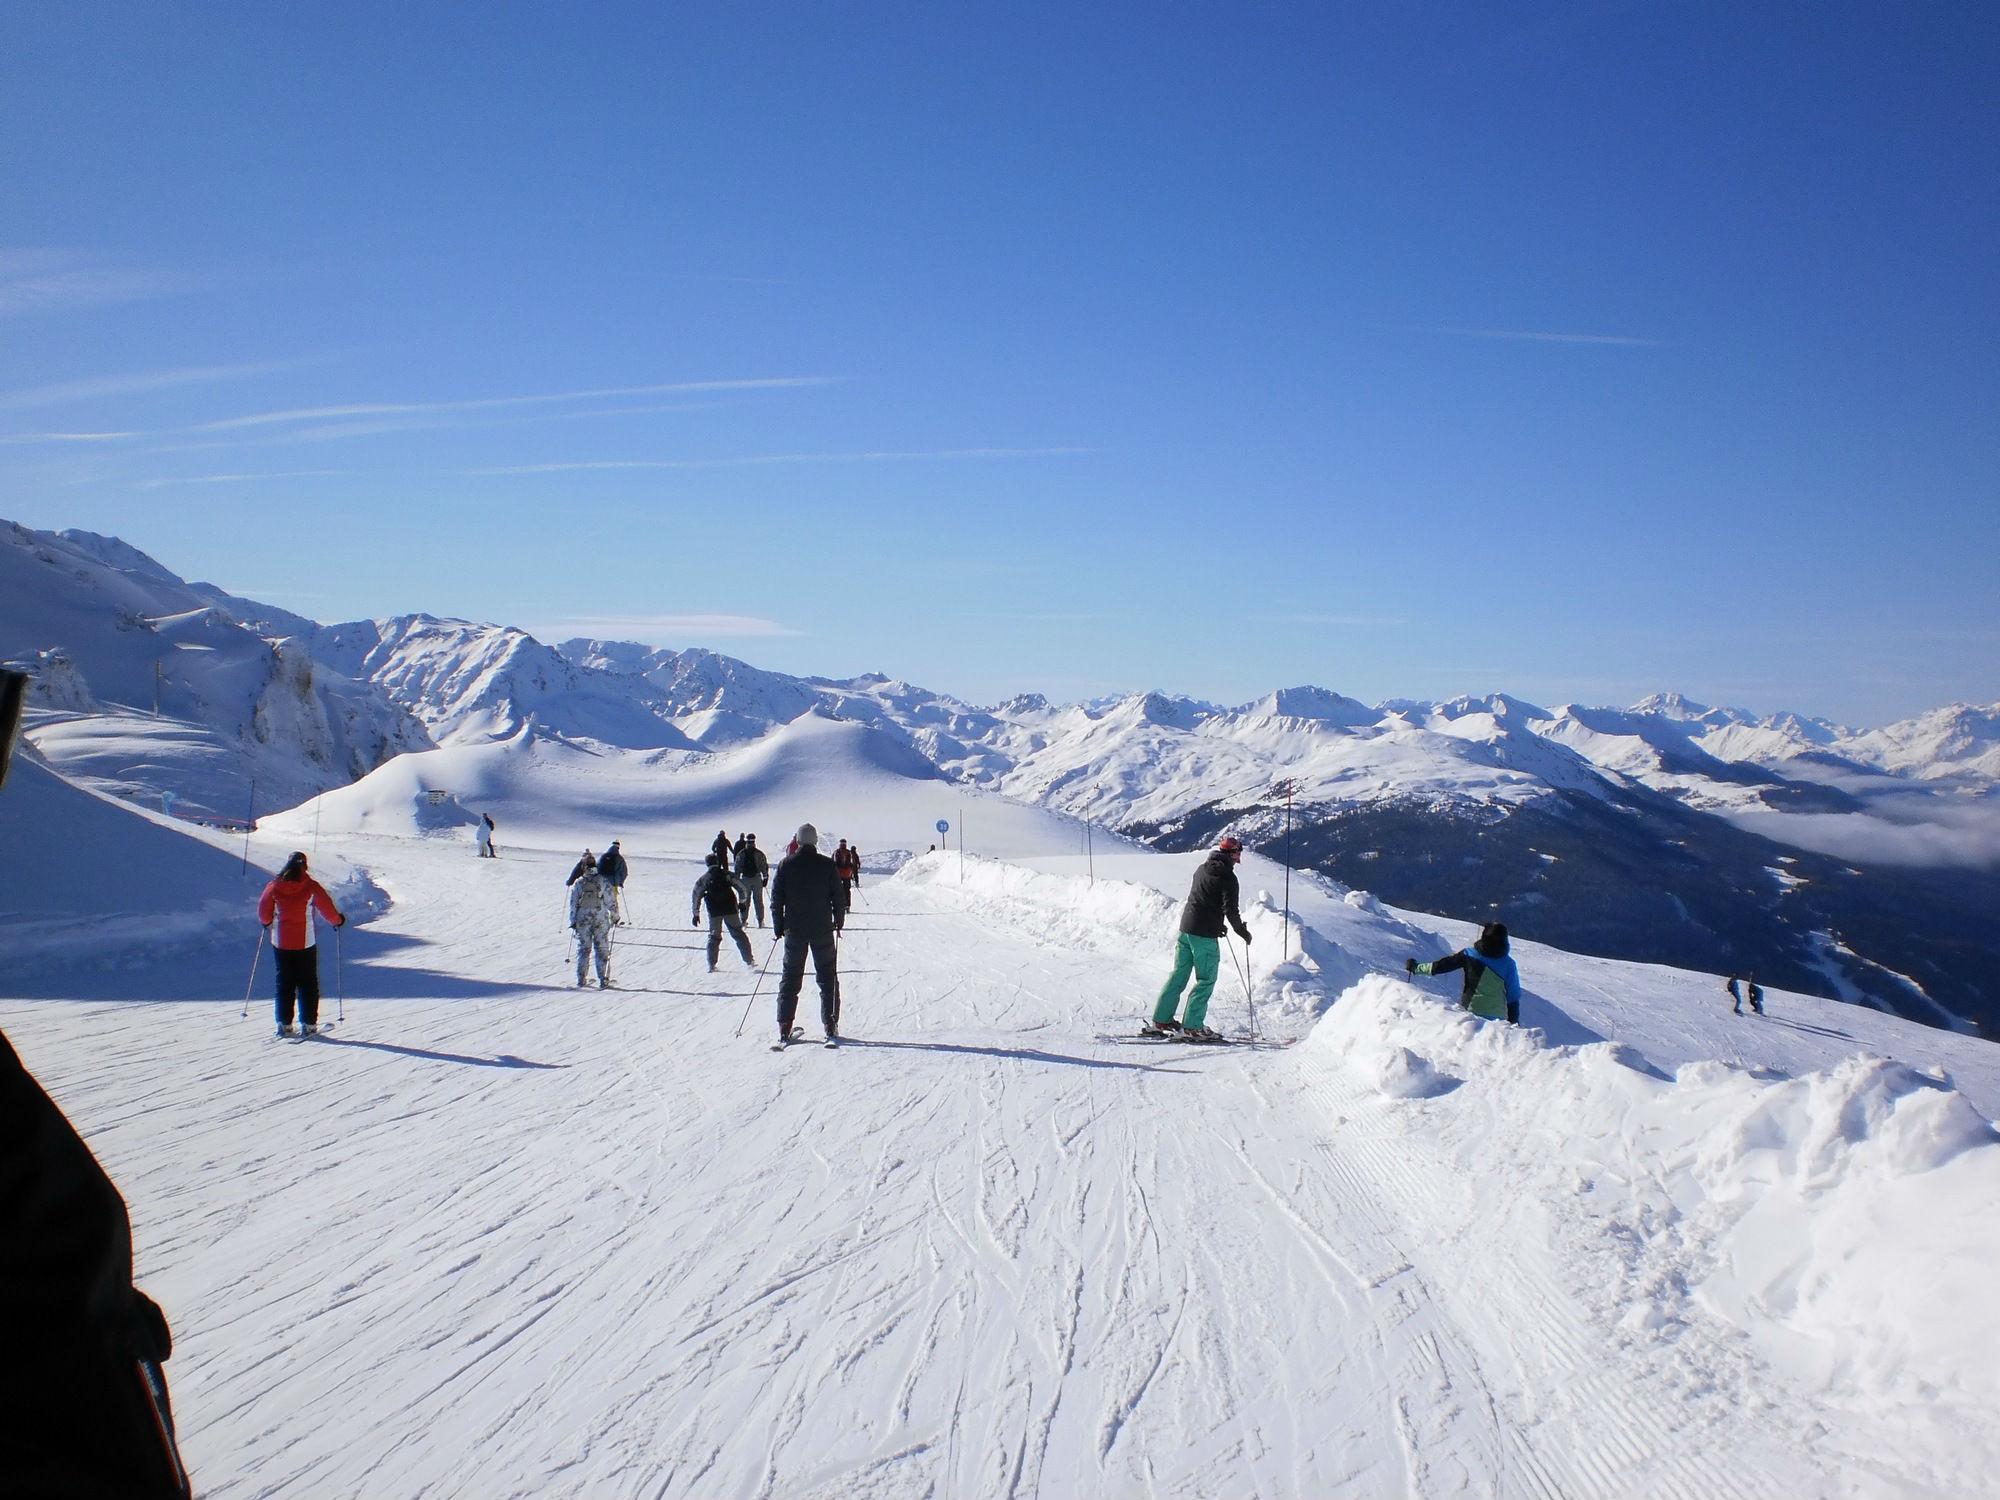 piste arc 1800 ciel bleu neige skieurs